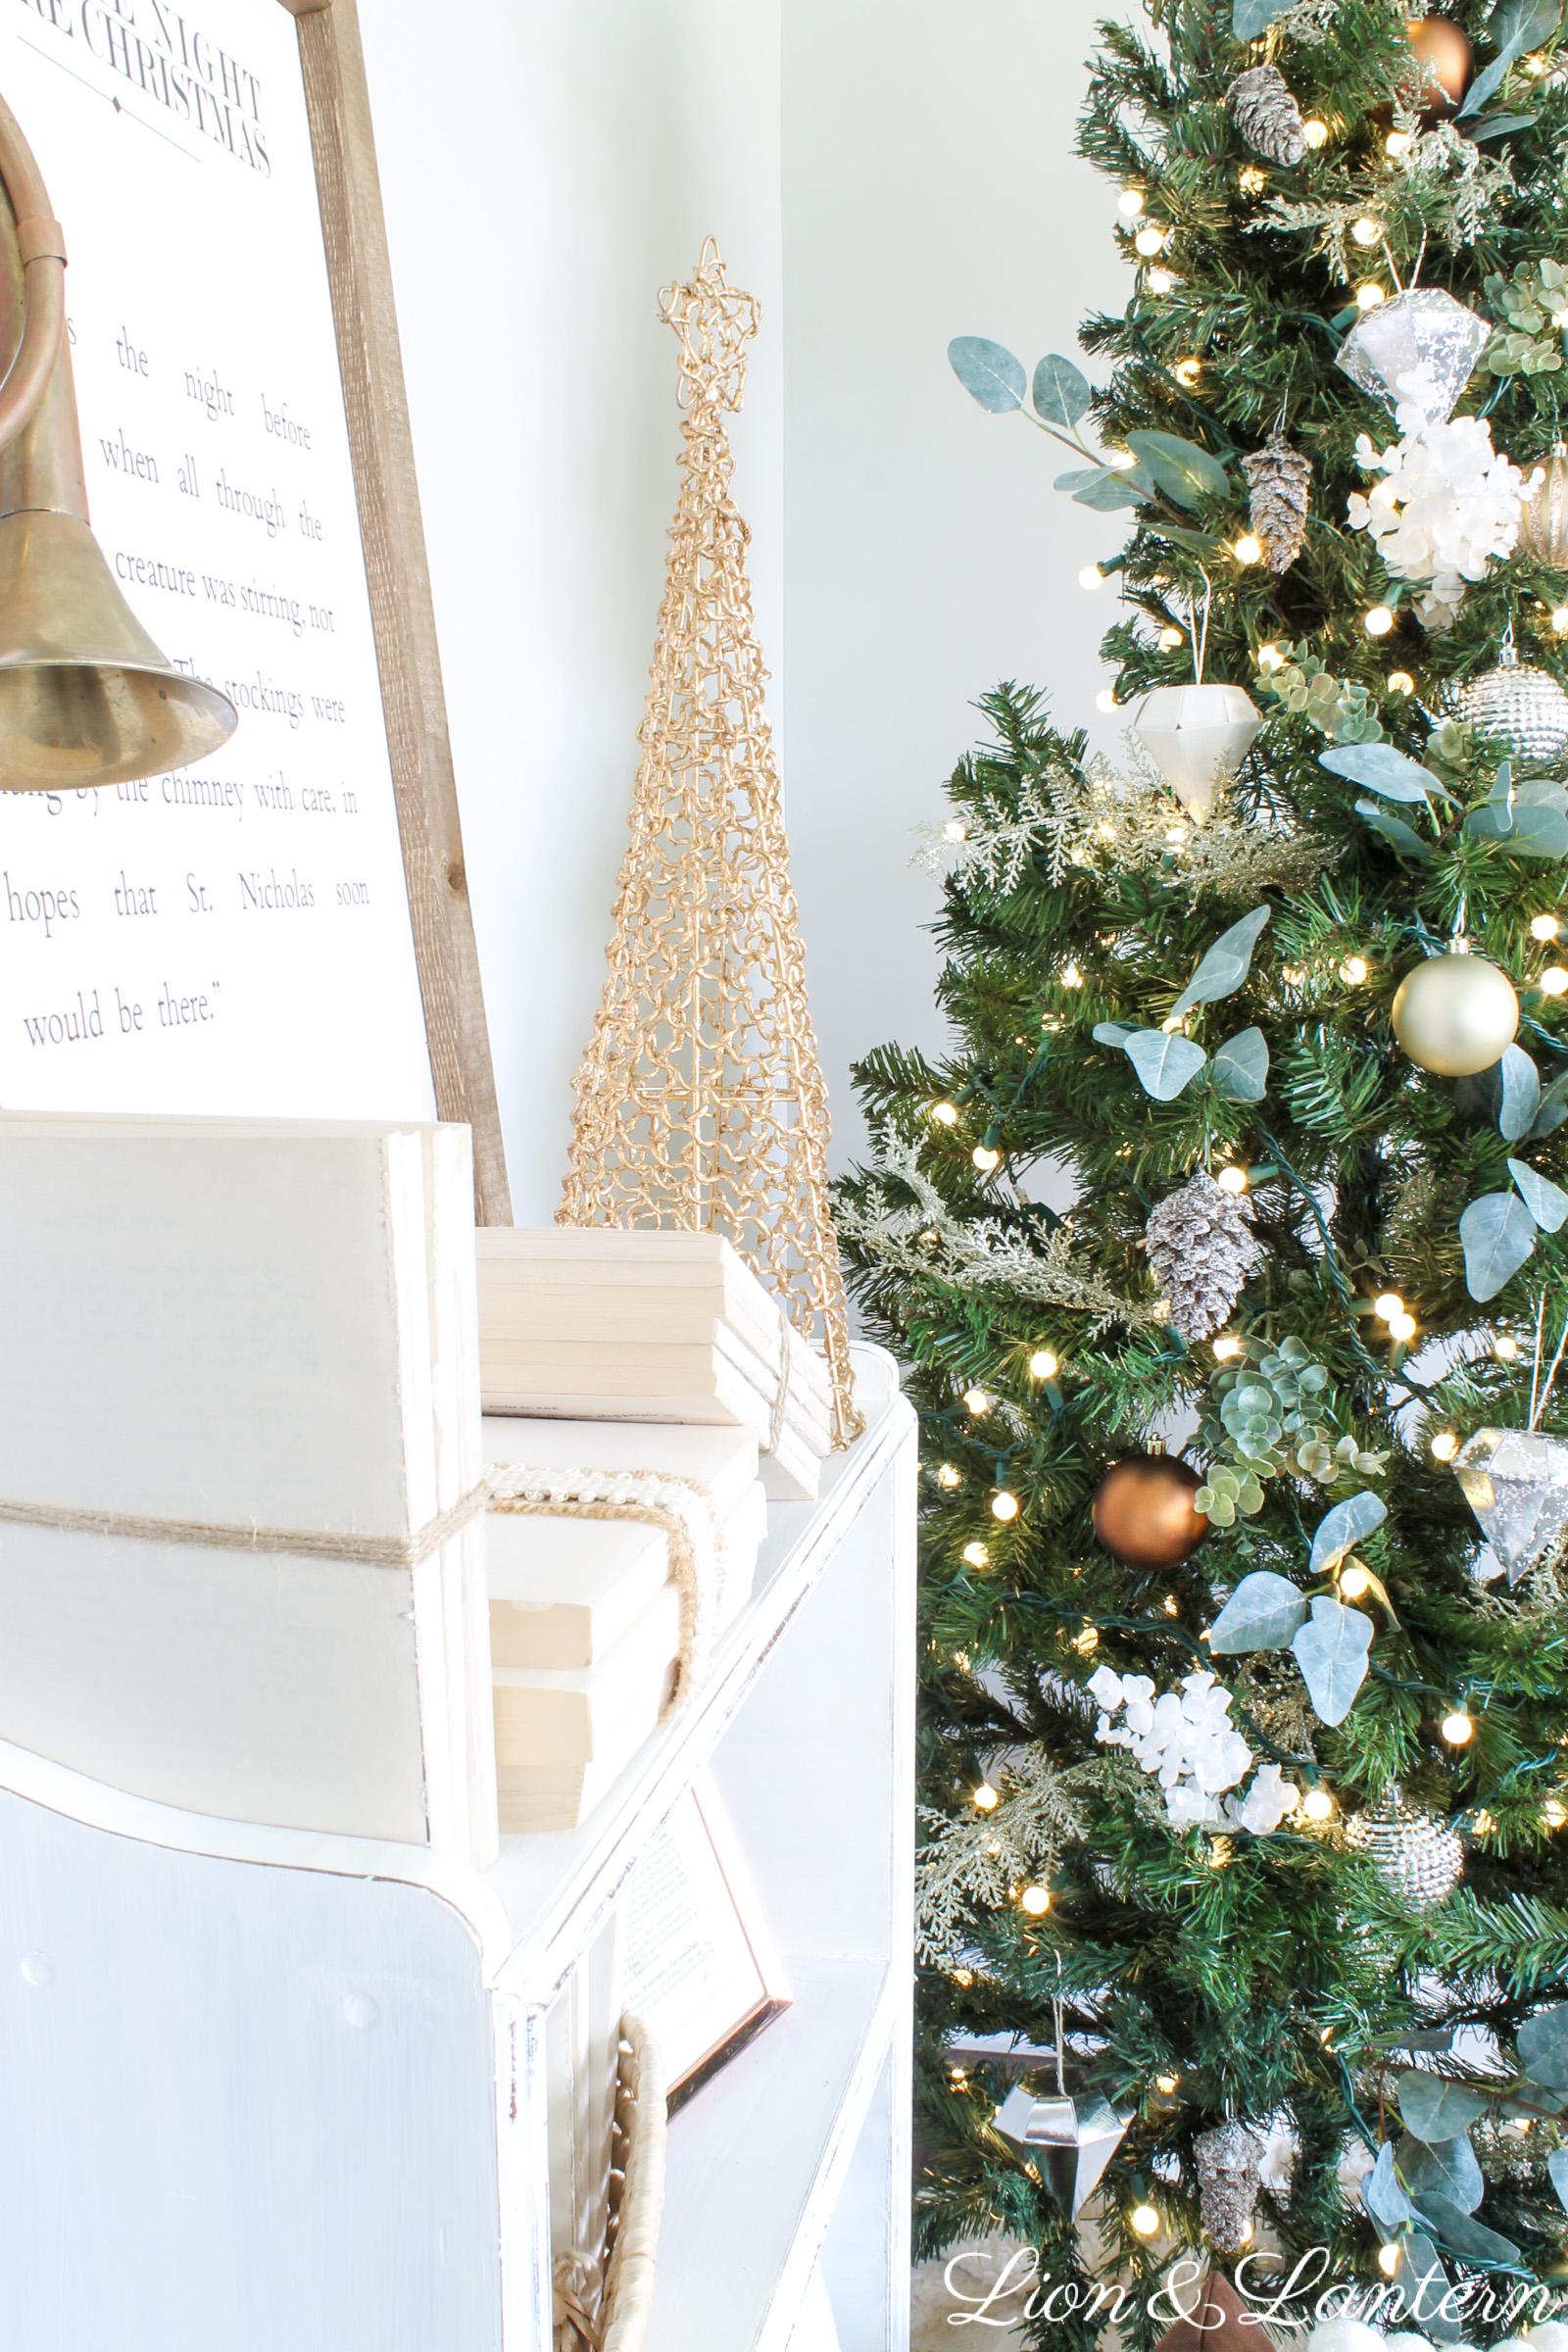 Simple Rustic Christmas Tree at LionAndLantern.com. Farmhouse Christmas, DIY Christmas decor, Christmas tree inspiration, eucalyptus, copper, gold, silver, pinecones